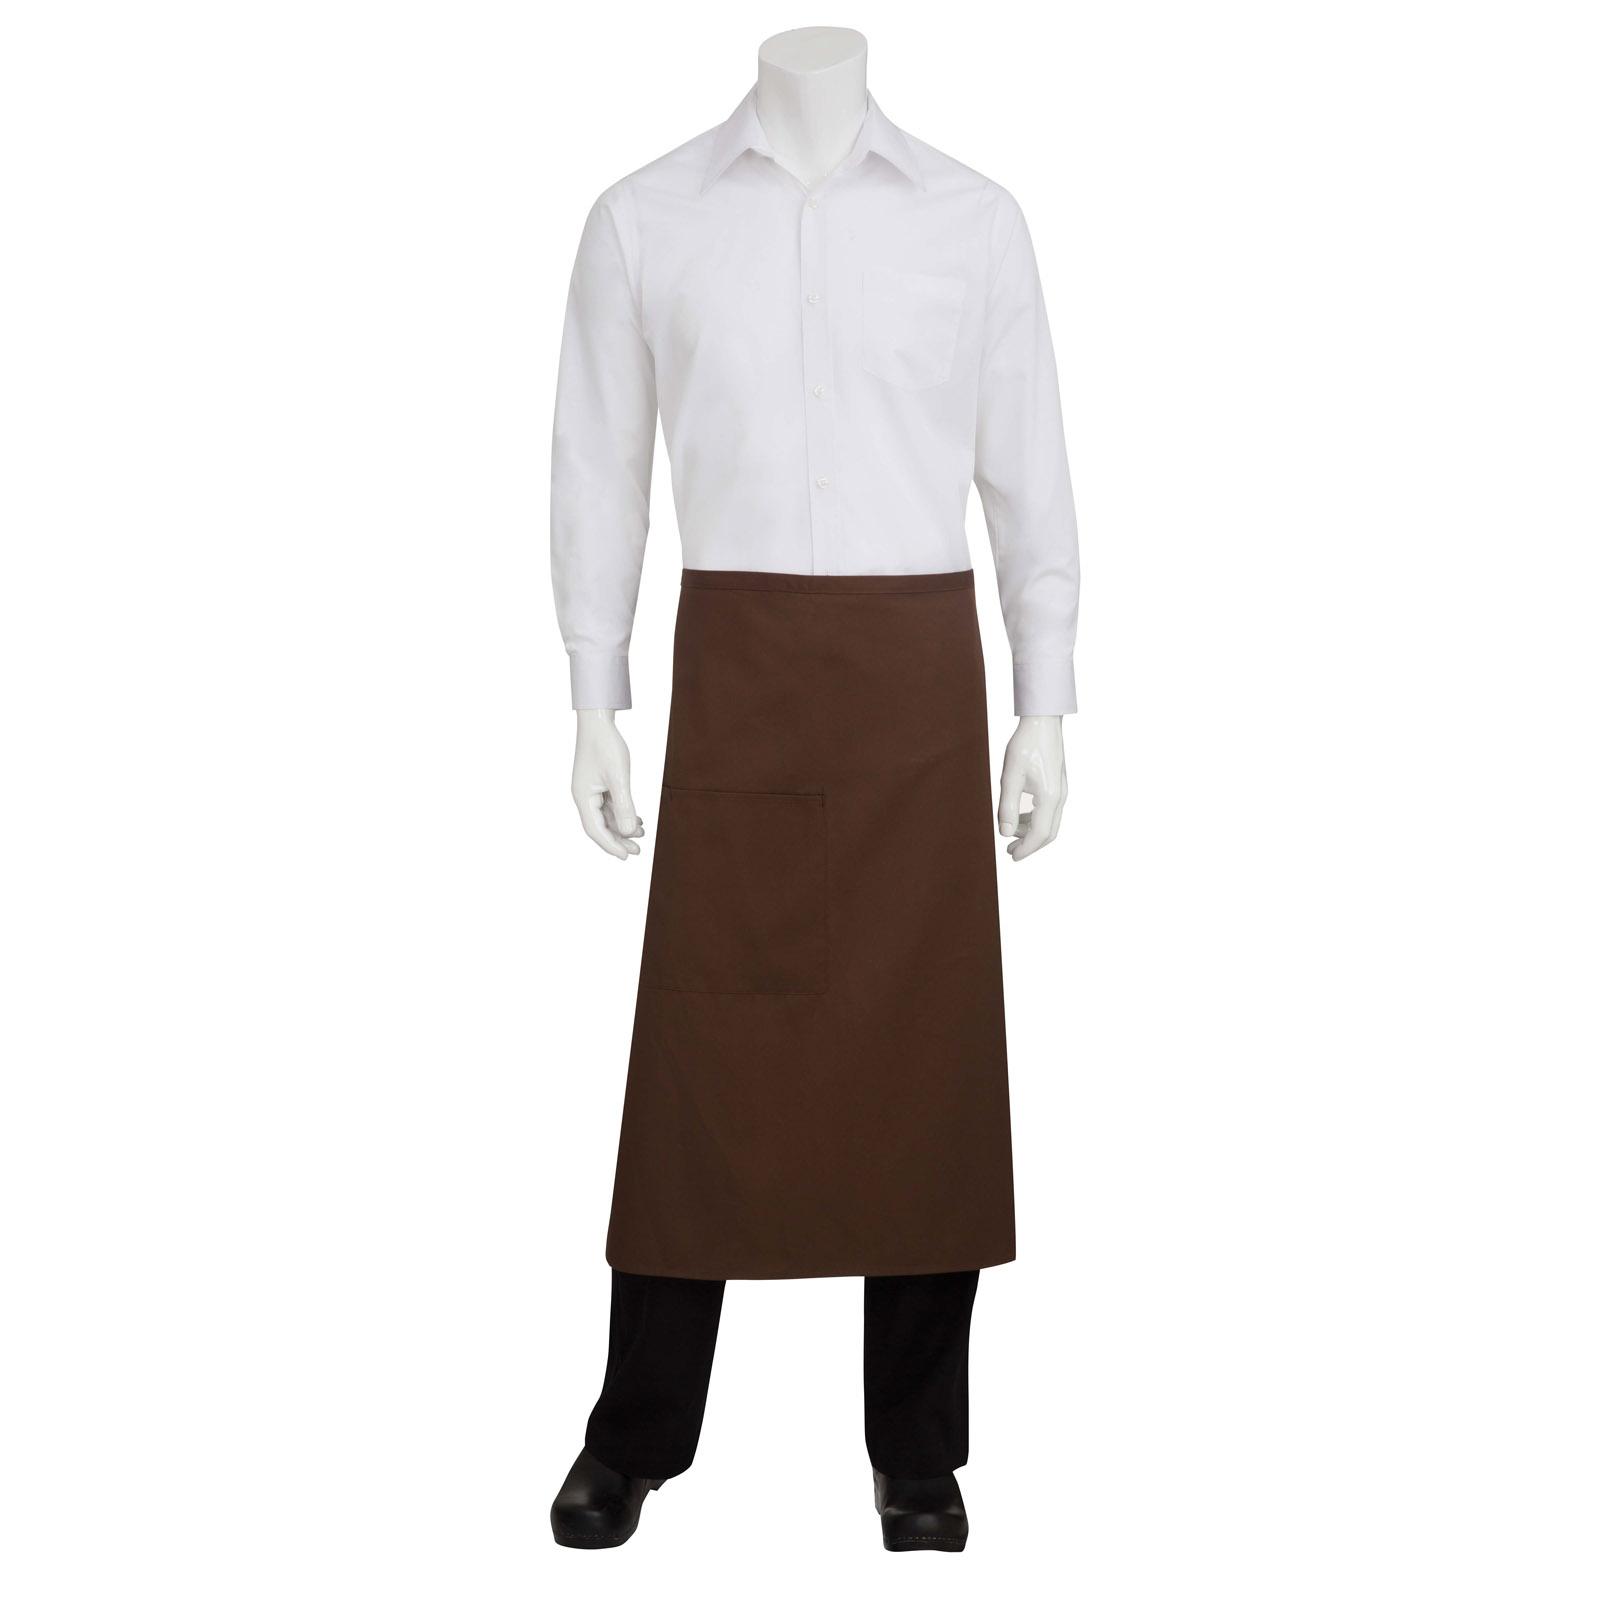 Chef Works F24 SLA0 waist apron